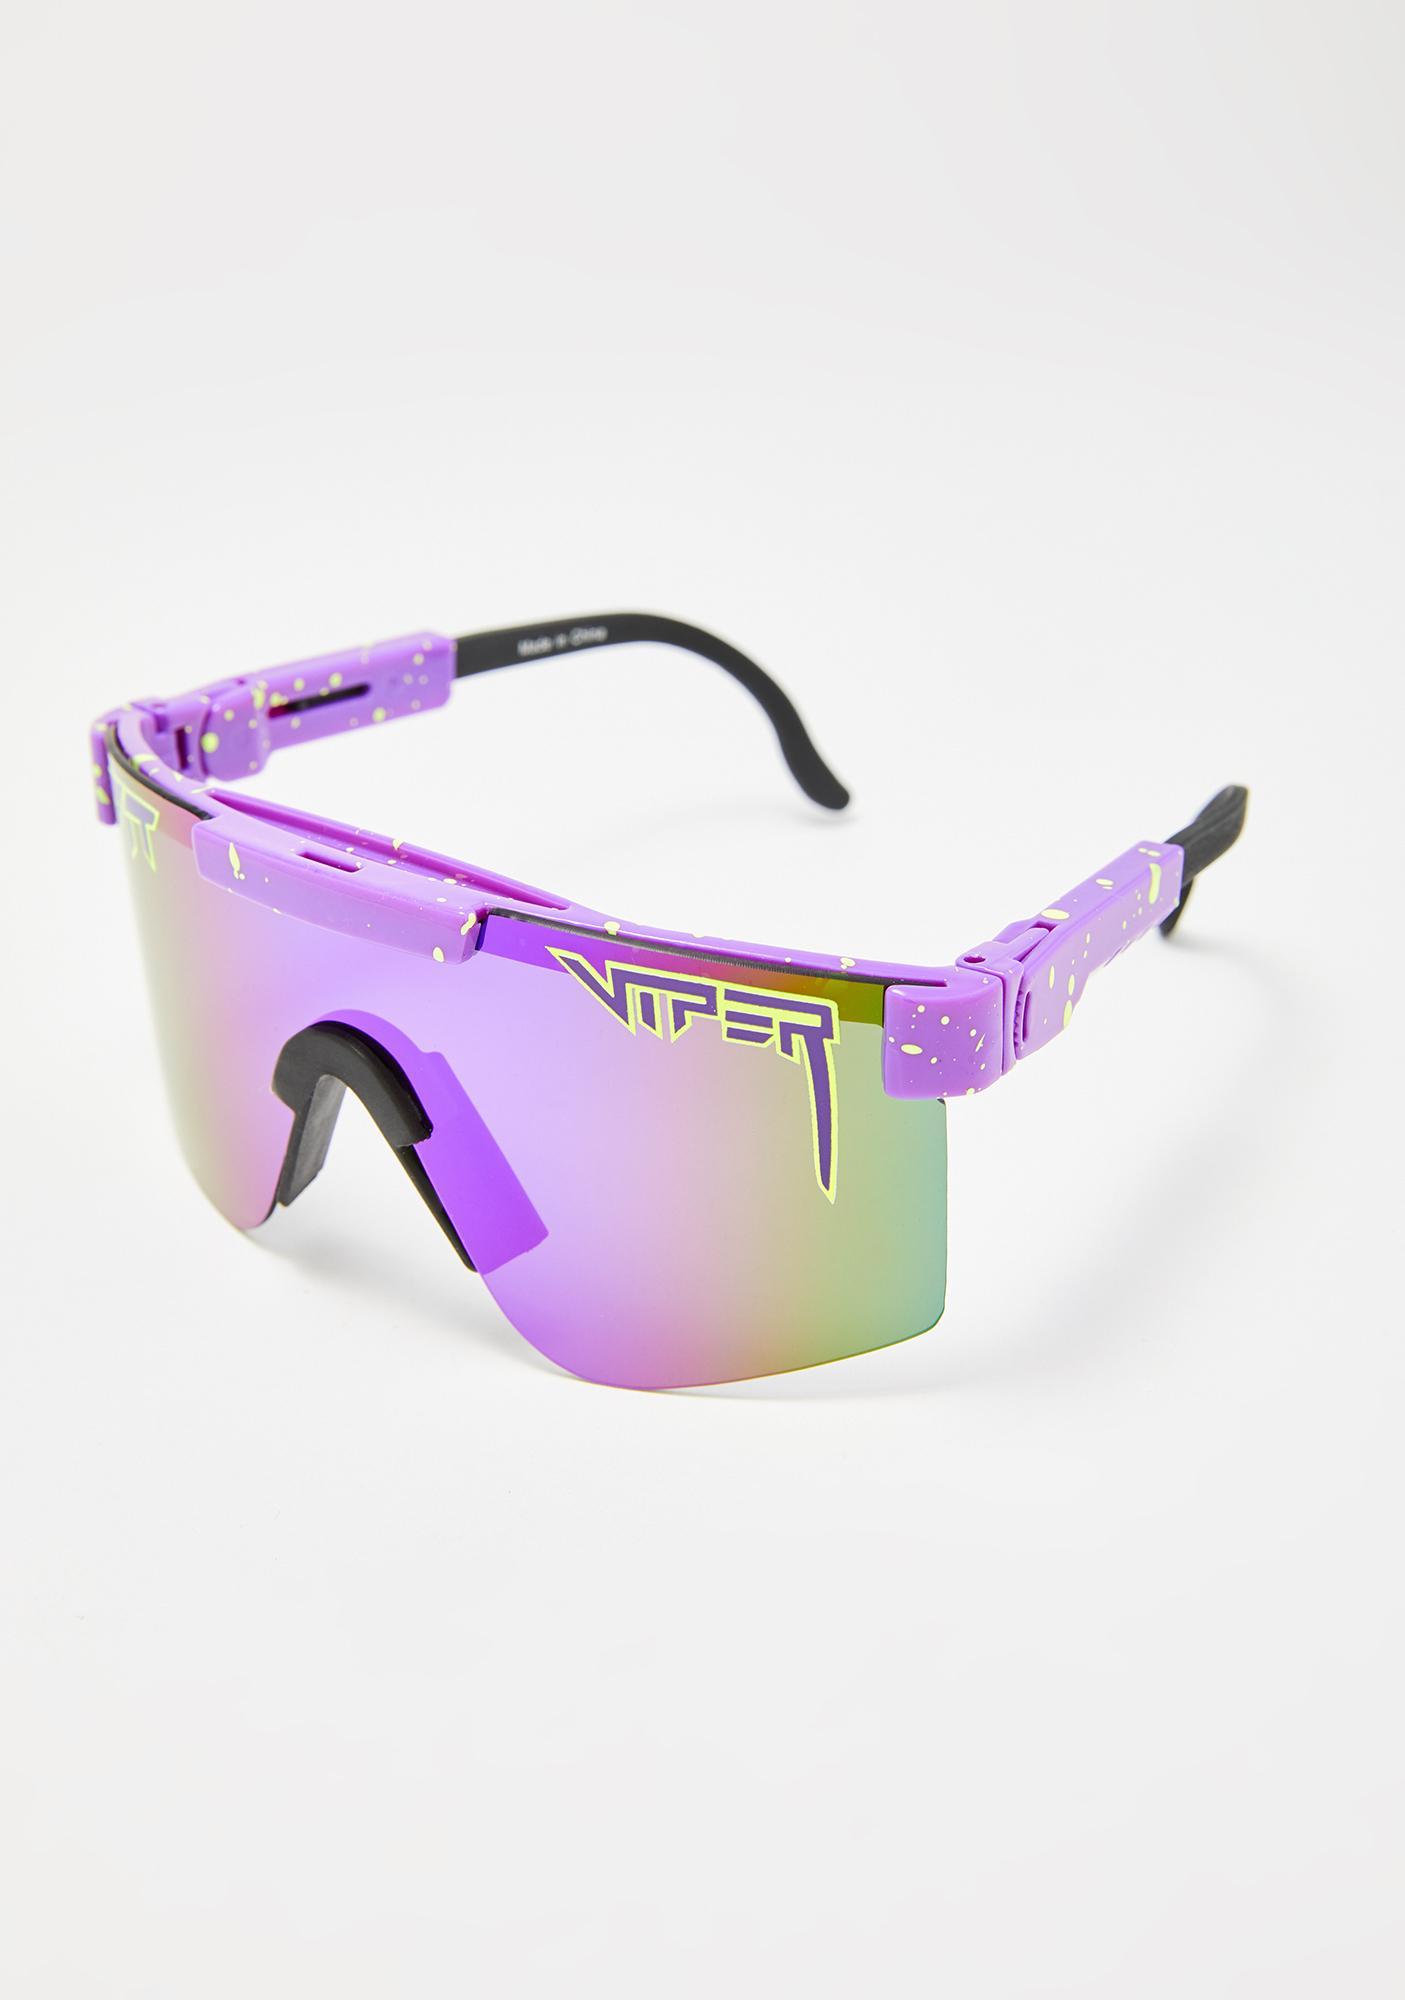 08b62f73cc7ba ... Pit Viper The Donatello Polarized Sunglasses